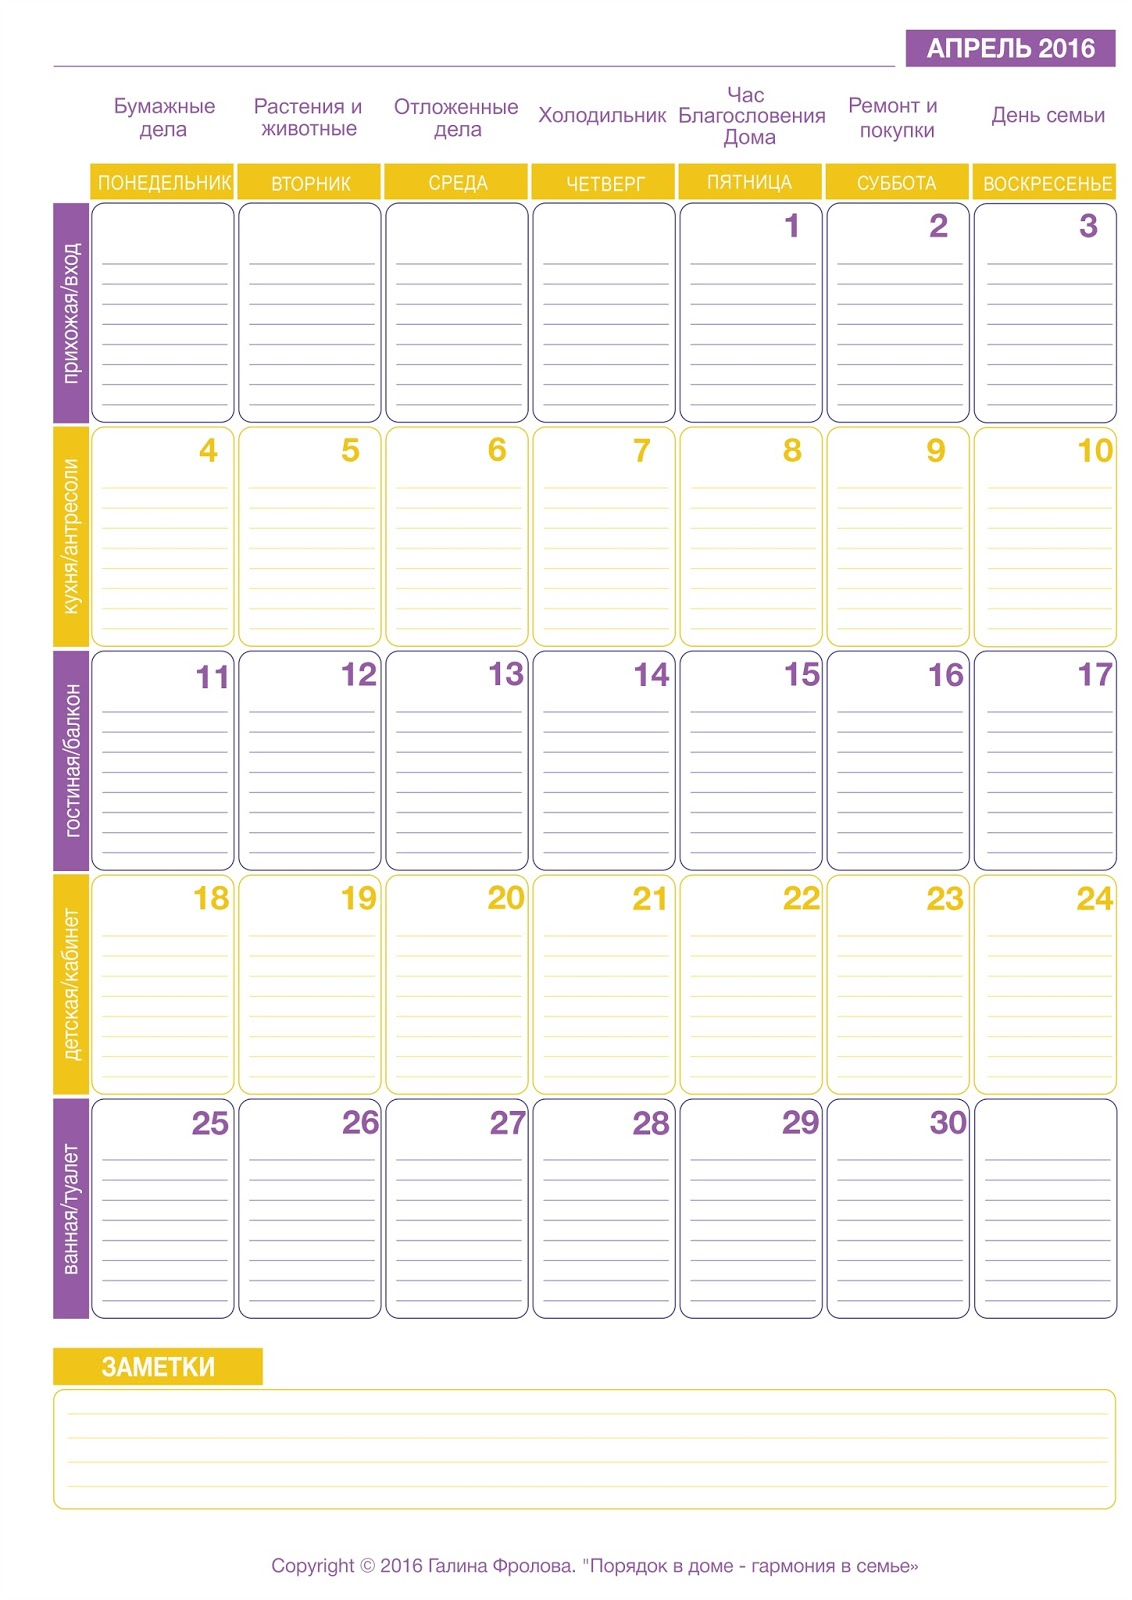 Семейный календарь планер на 2017